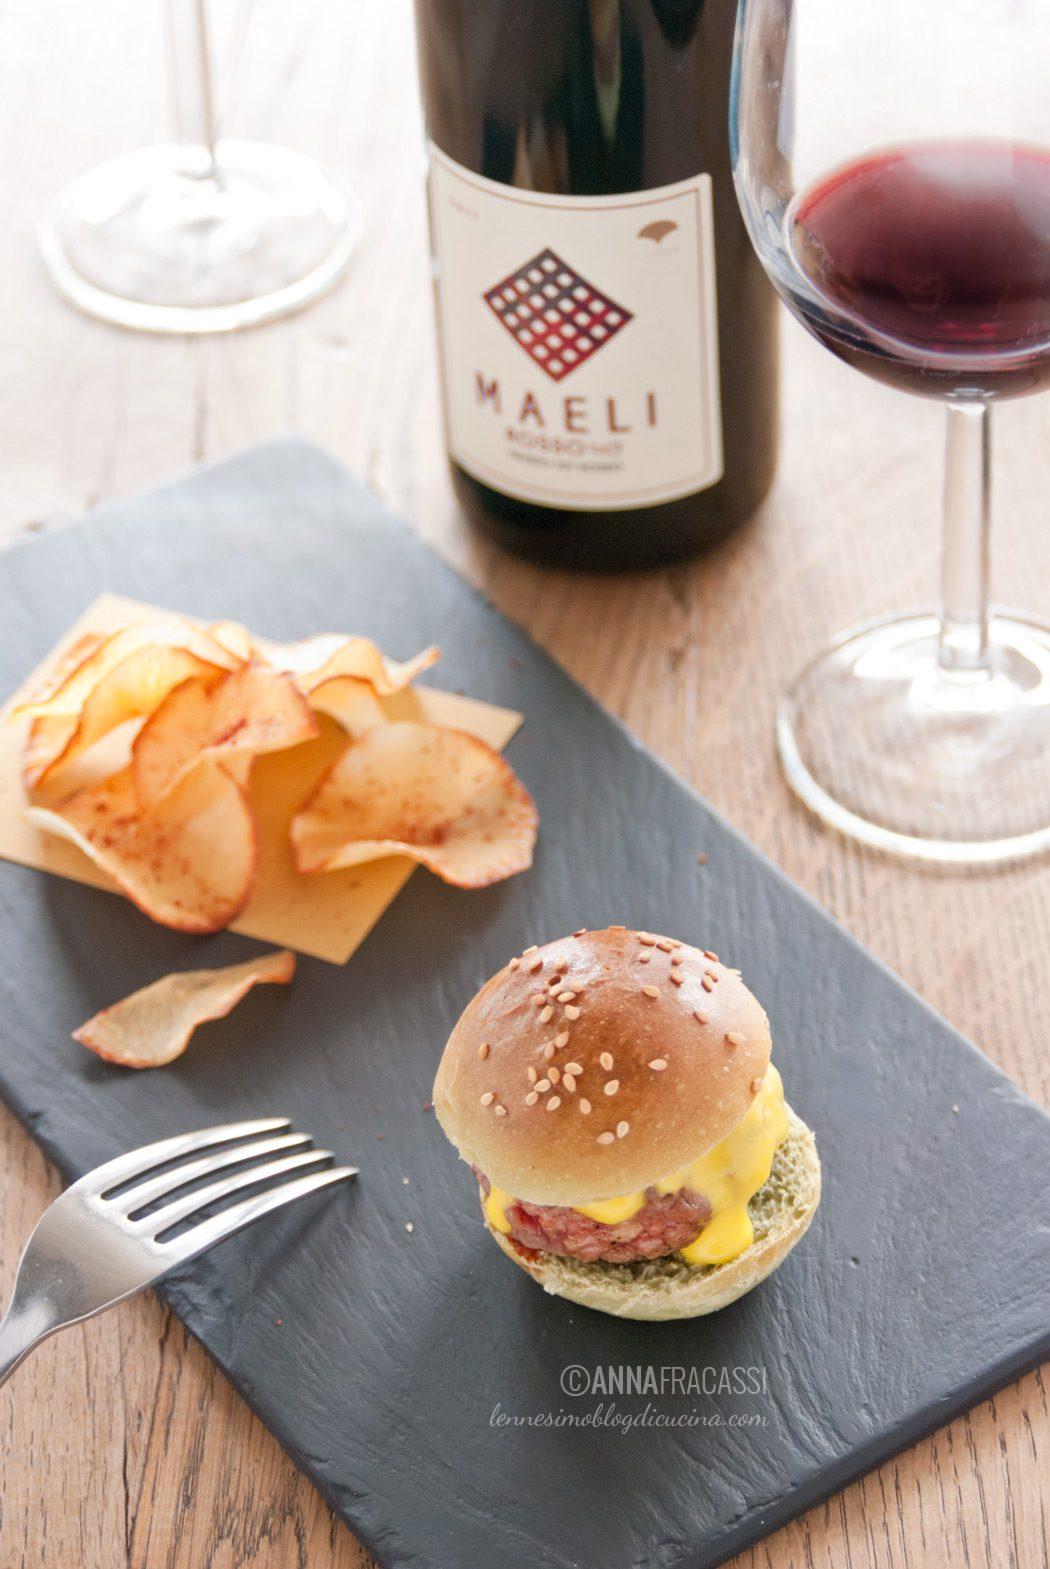 Mini burger di Fassona - vini Maeli - Mystic Burger